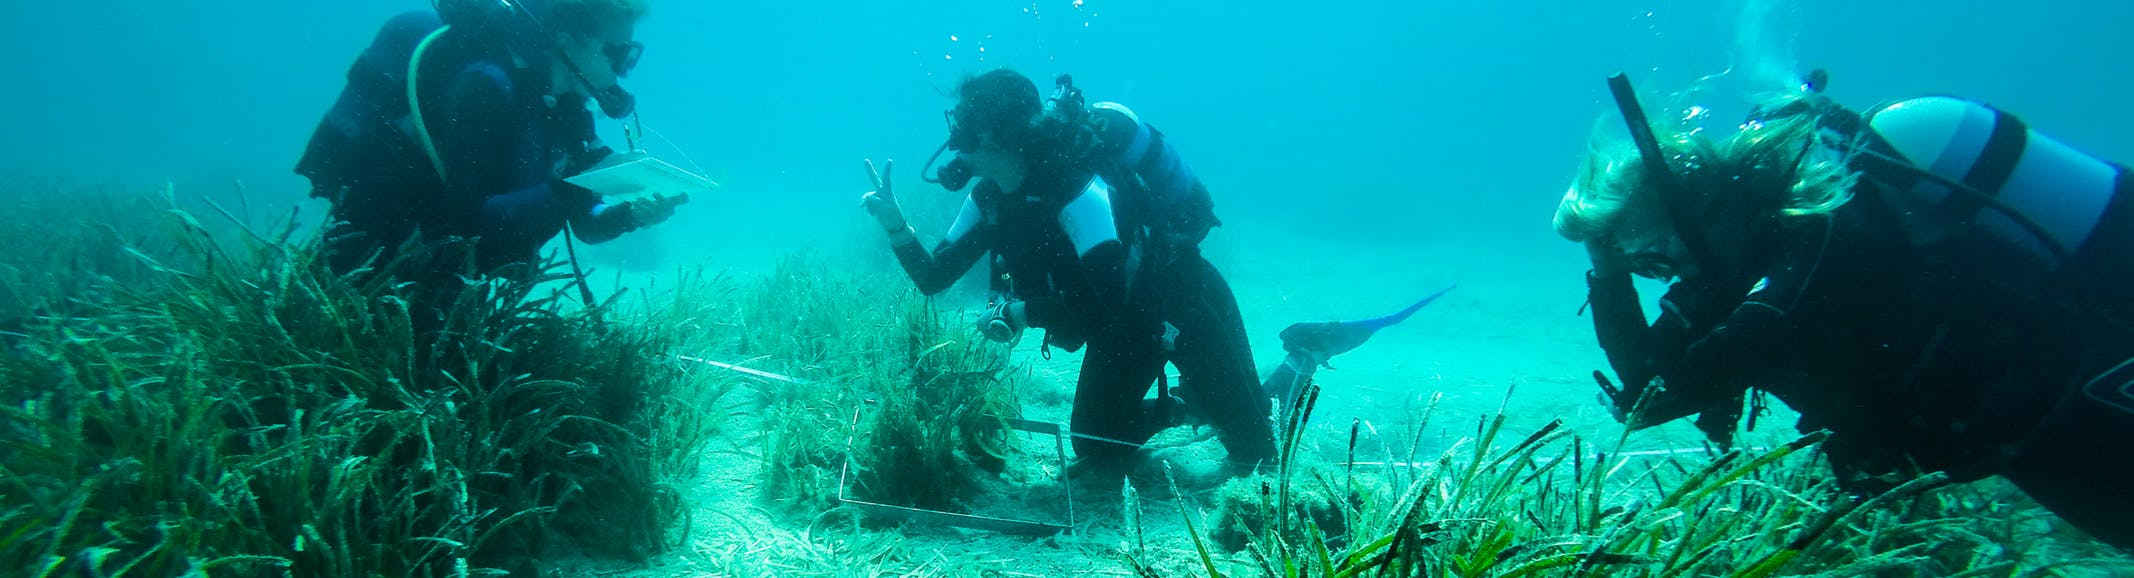 Wildlife Conservation & Environmental Internships Abroad